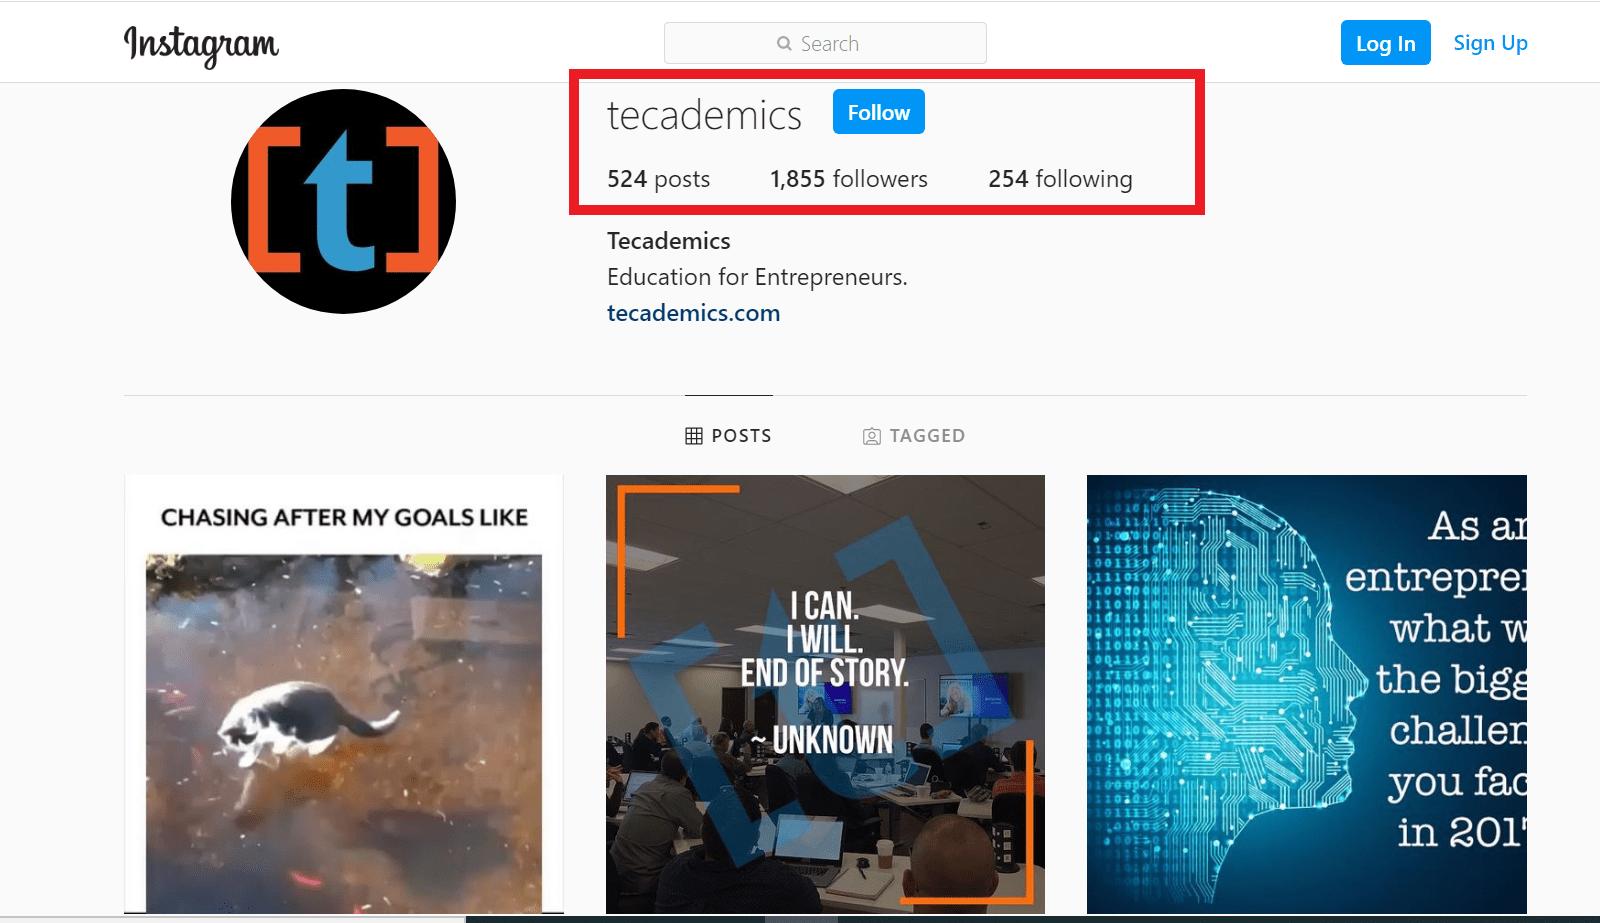 tecademics instagram